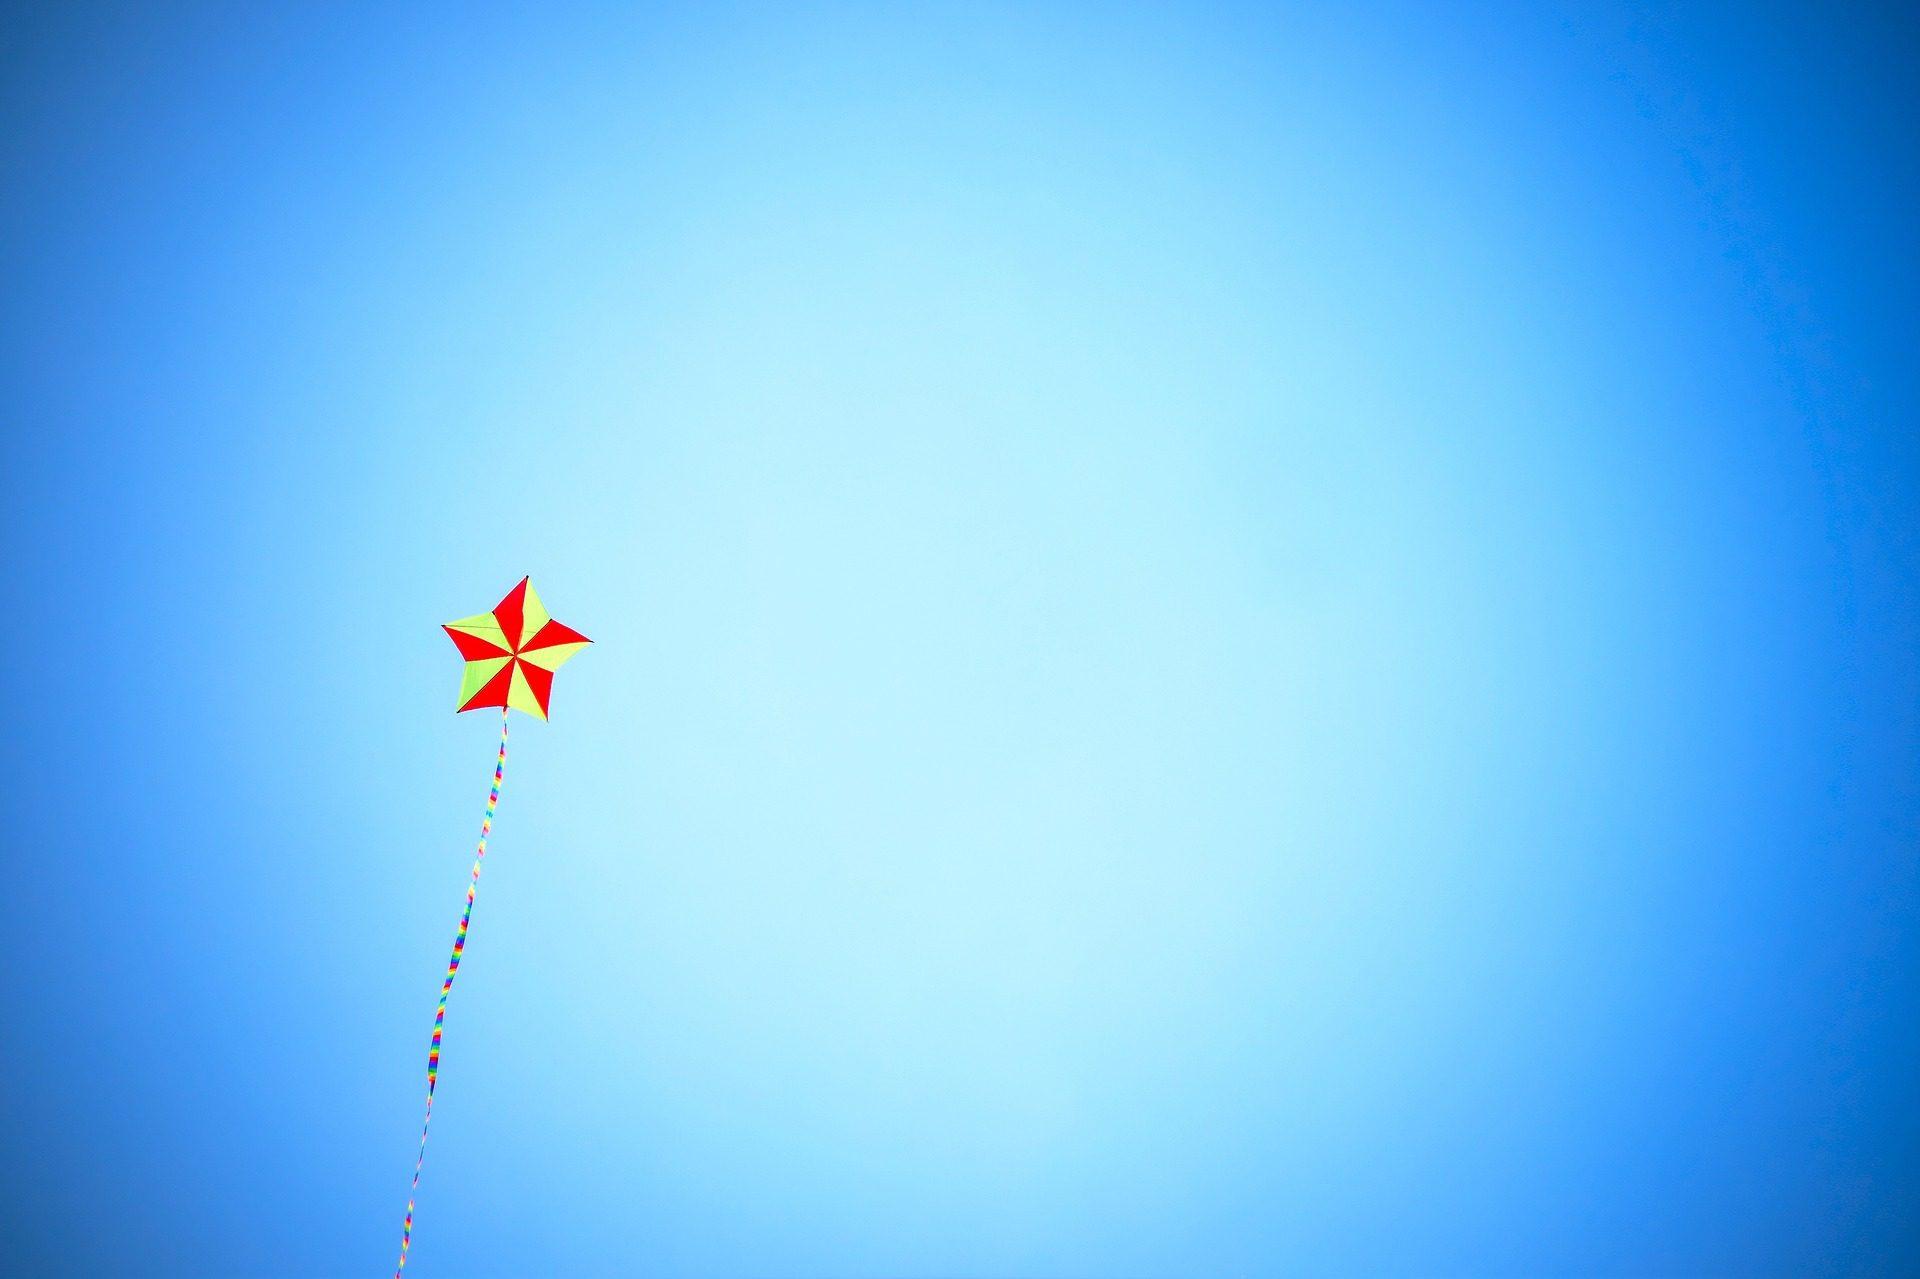 Sky, cerf-volant, Star, coloré, mouche, jeu - Fonds d'écran HD - Professor-falken.com